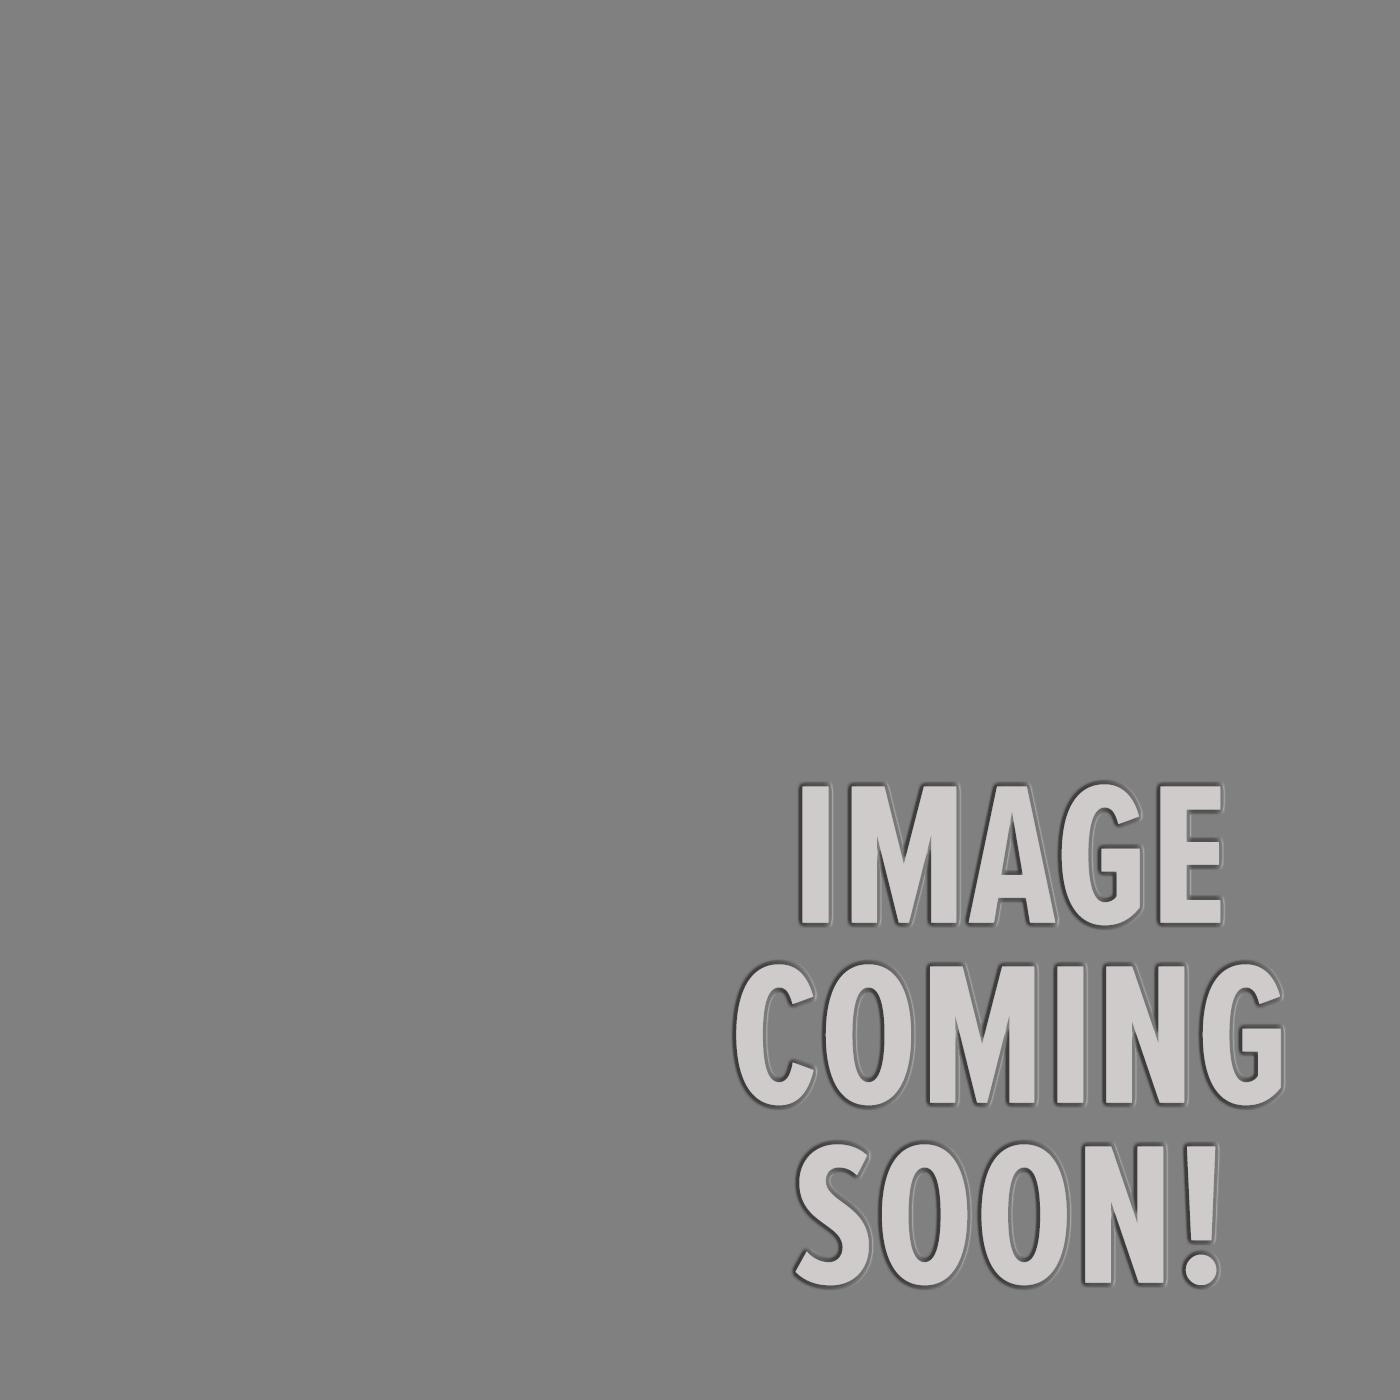 Fender American Acoustasonic Stratocaster Acoustic-Electric Guitar Black